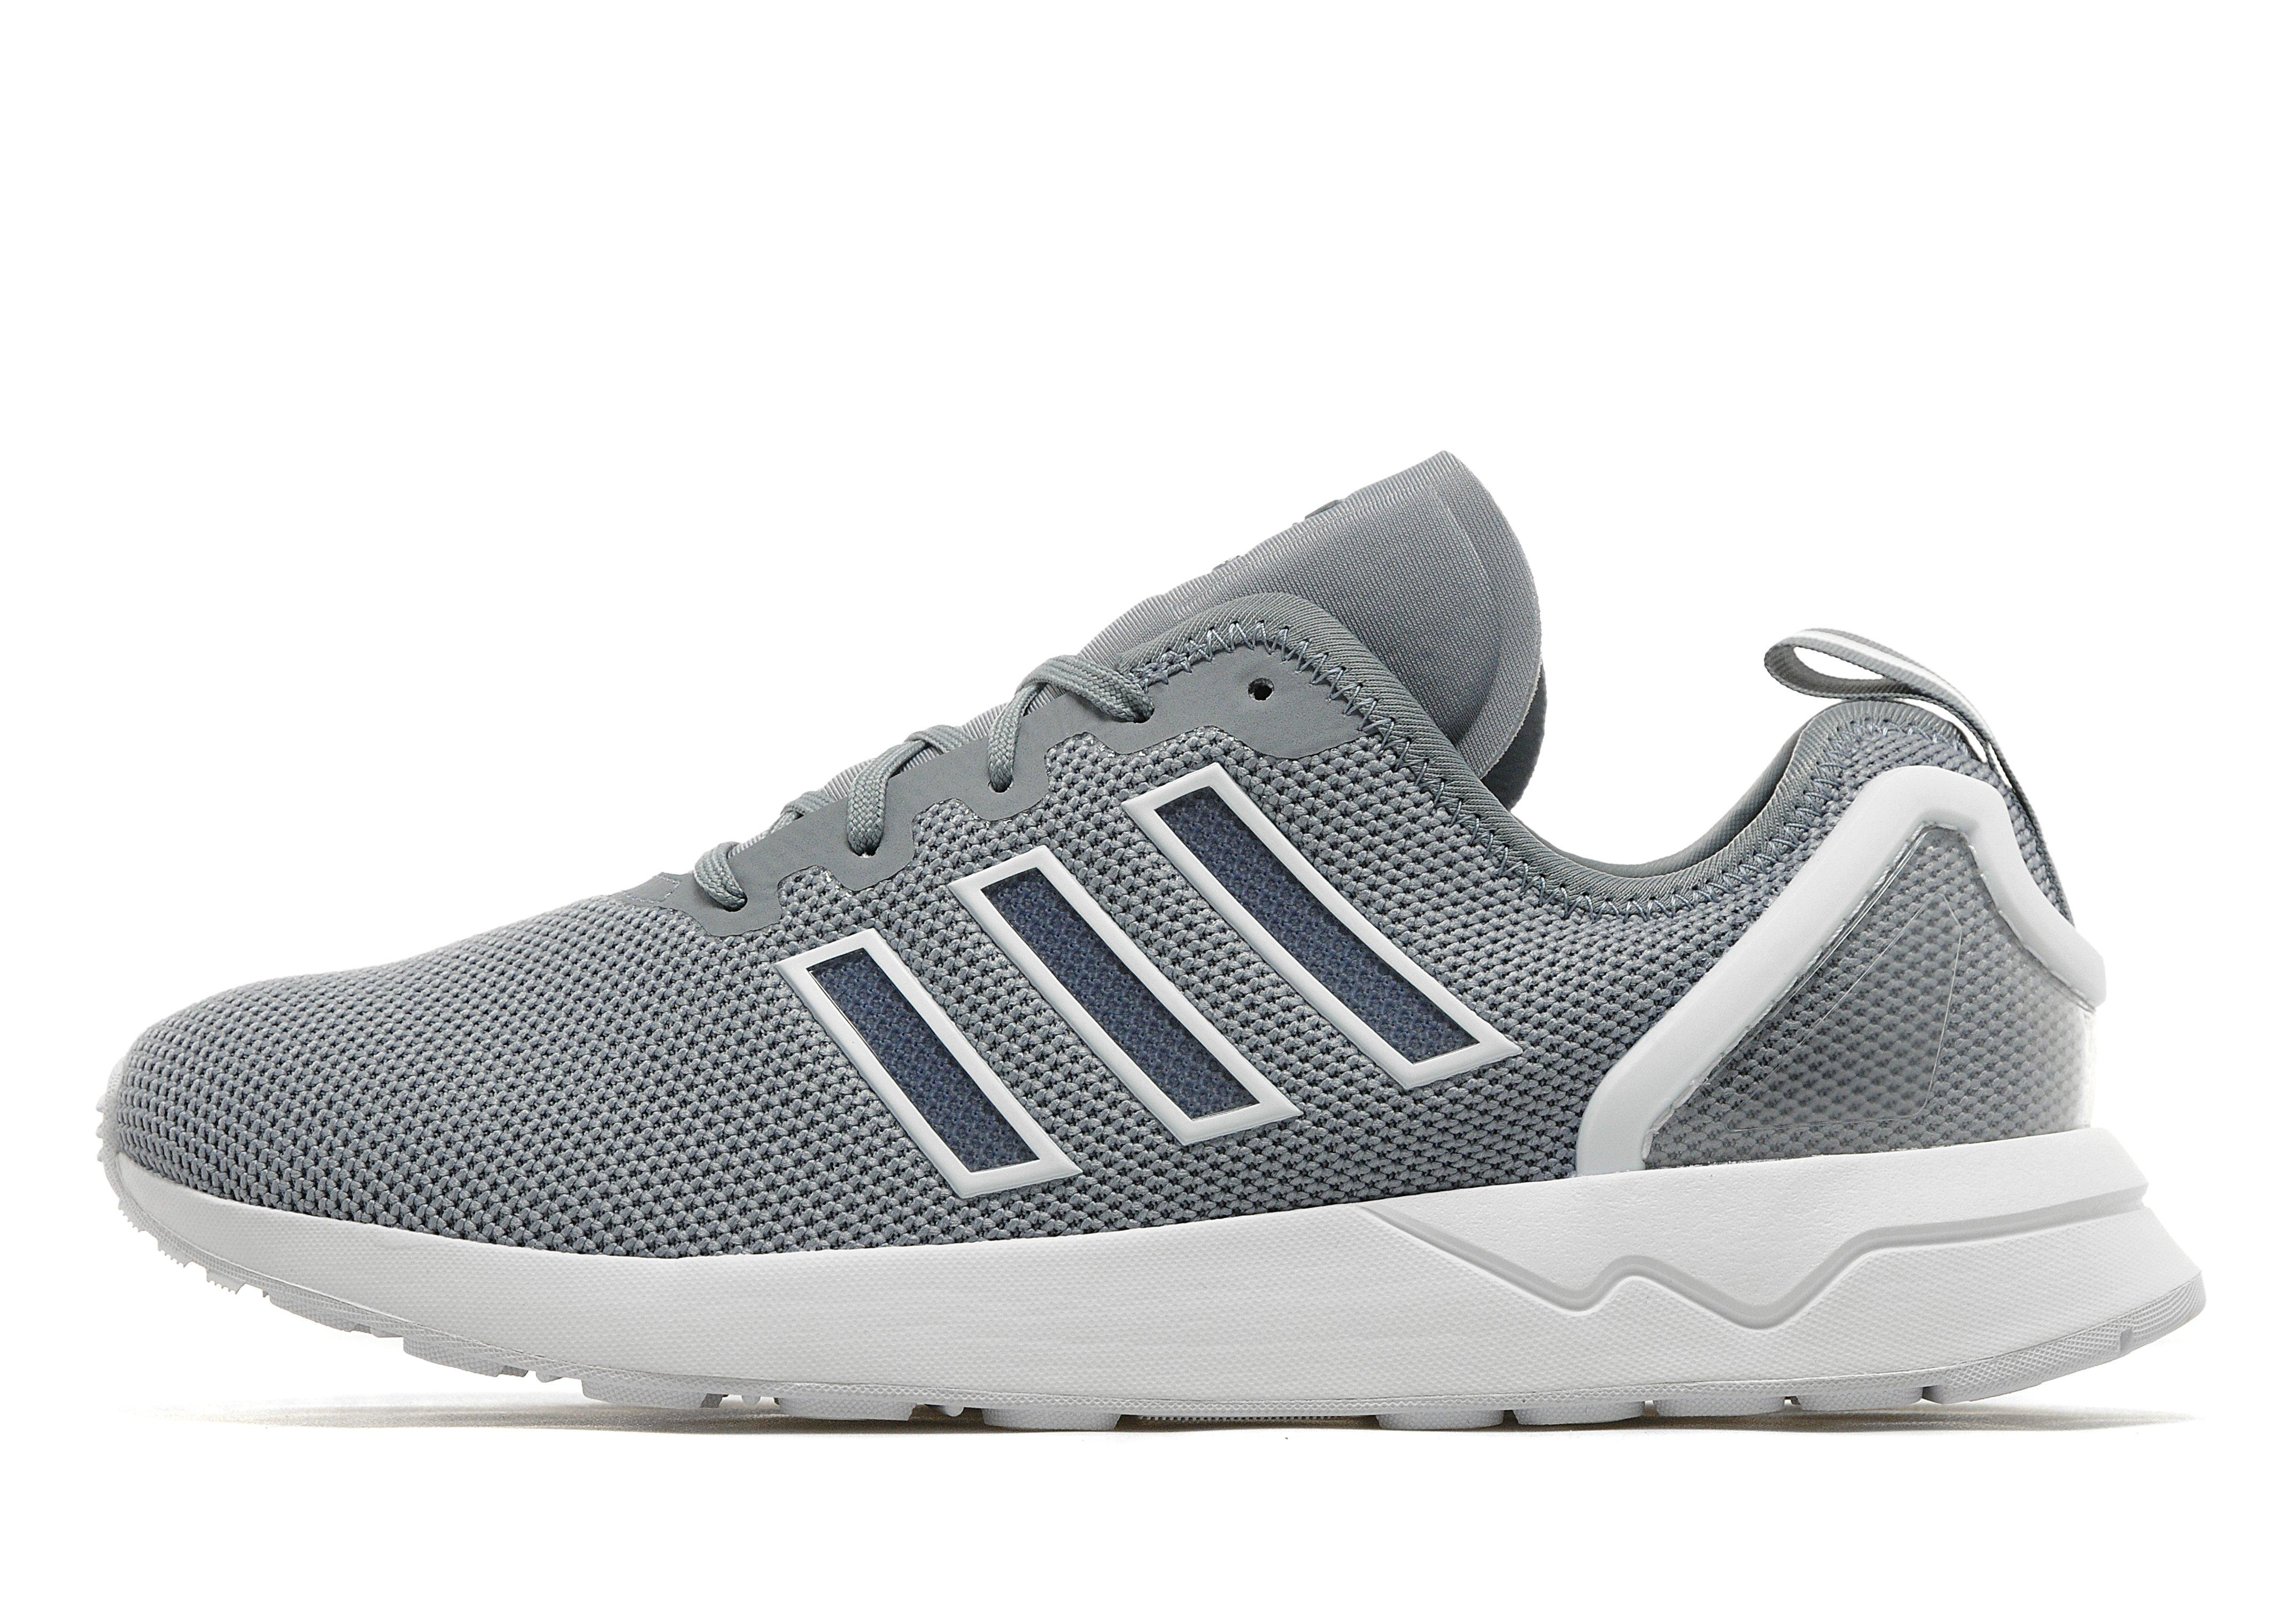 Adidas Zx Flux Adv Grey